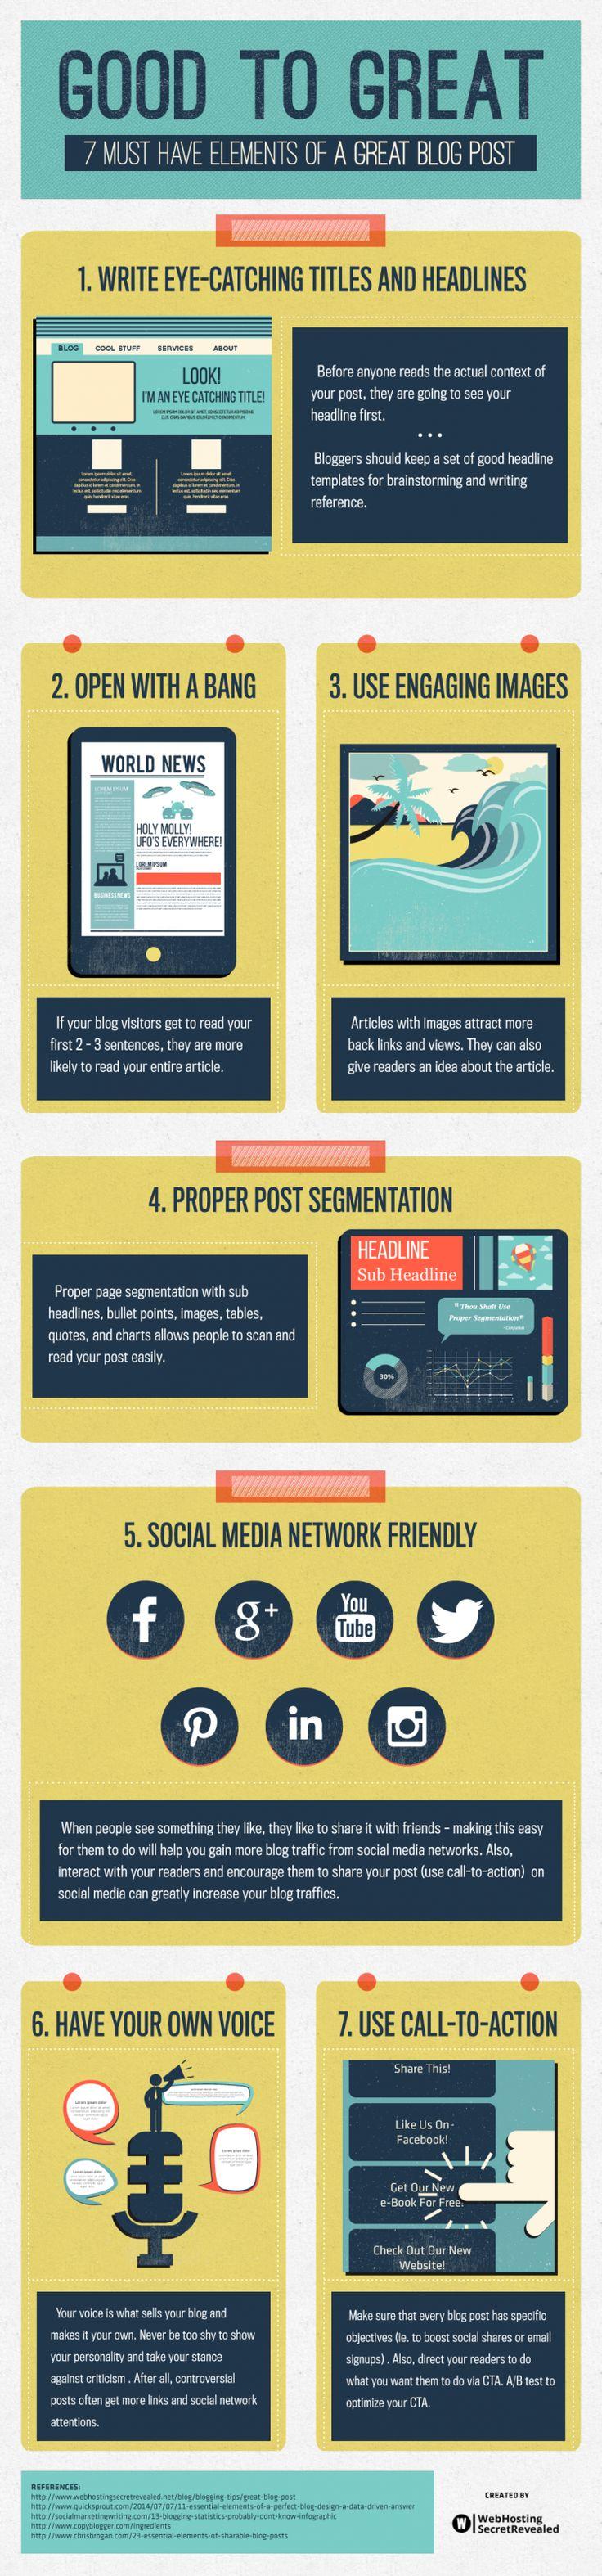 7 elementos de un gran post para tu blog #infografia #infographic #socialmedia